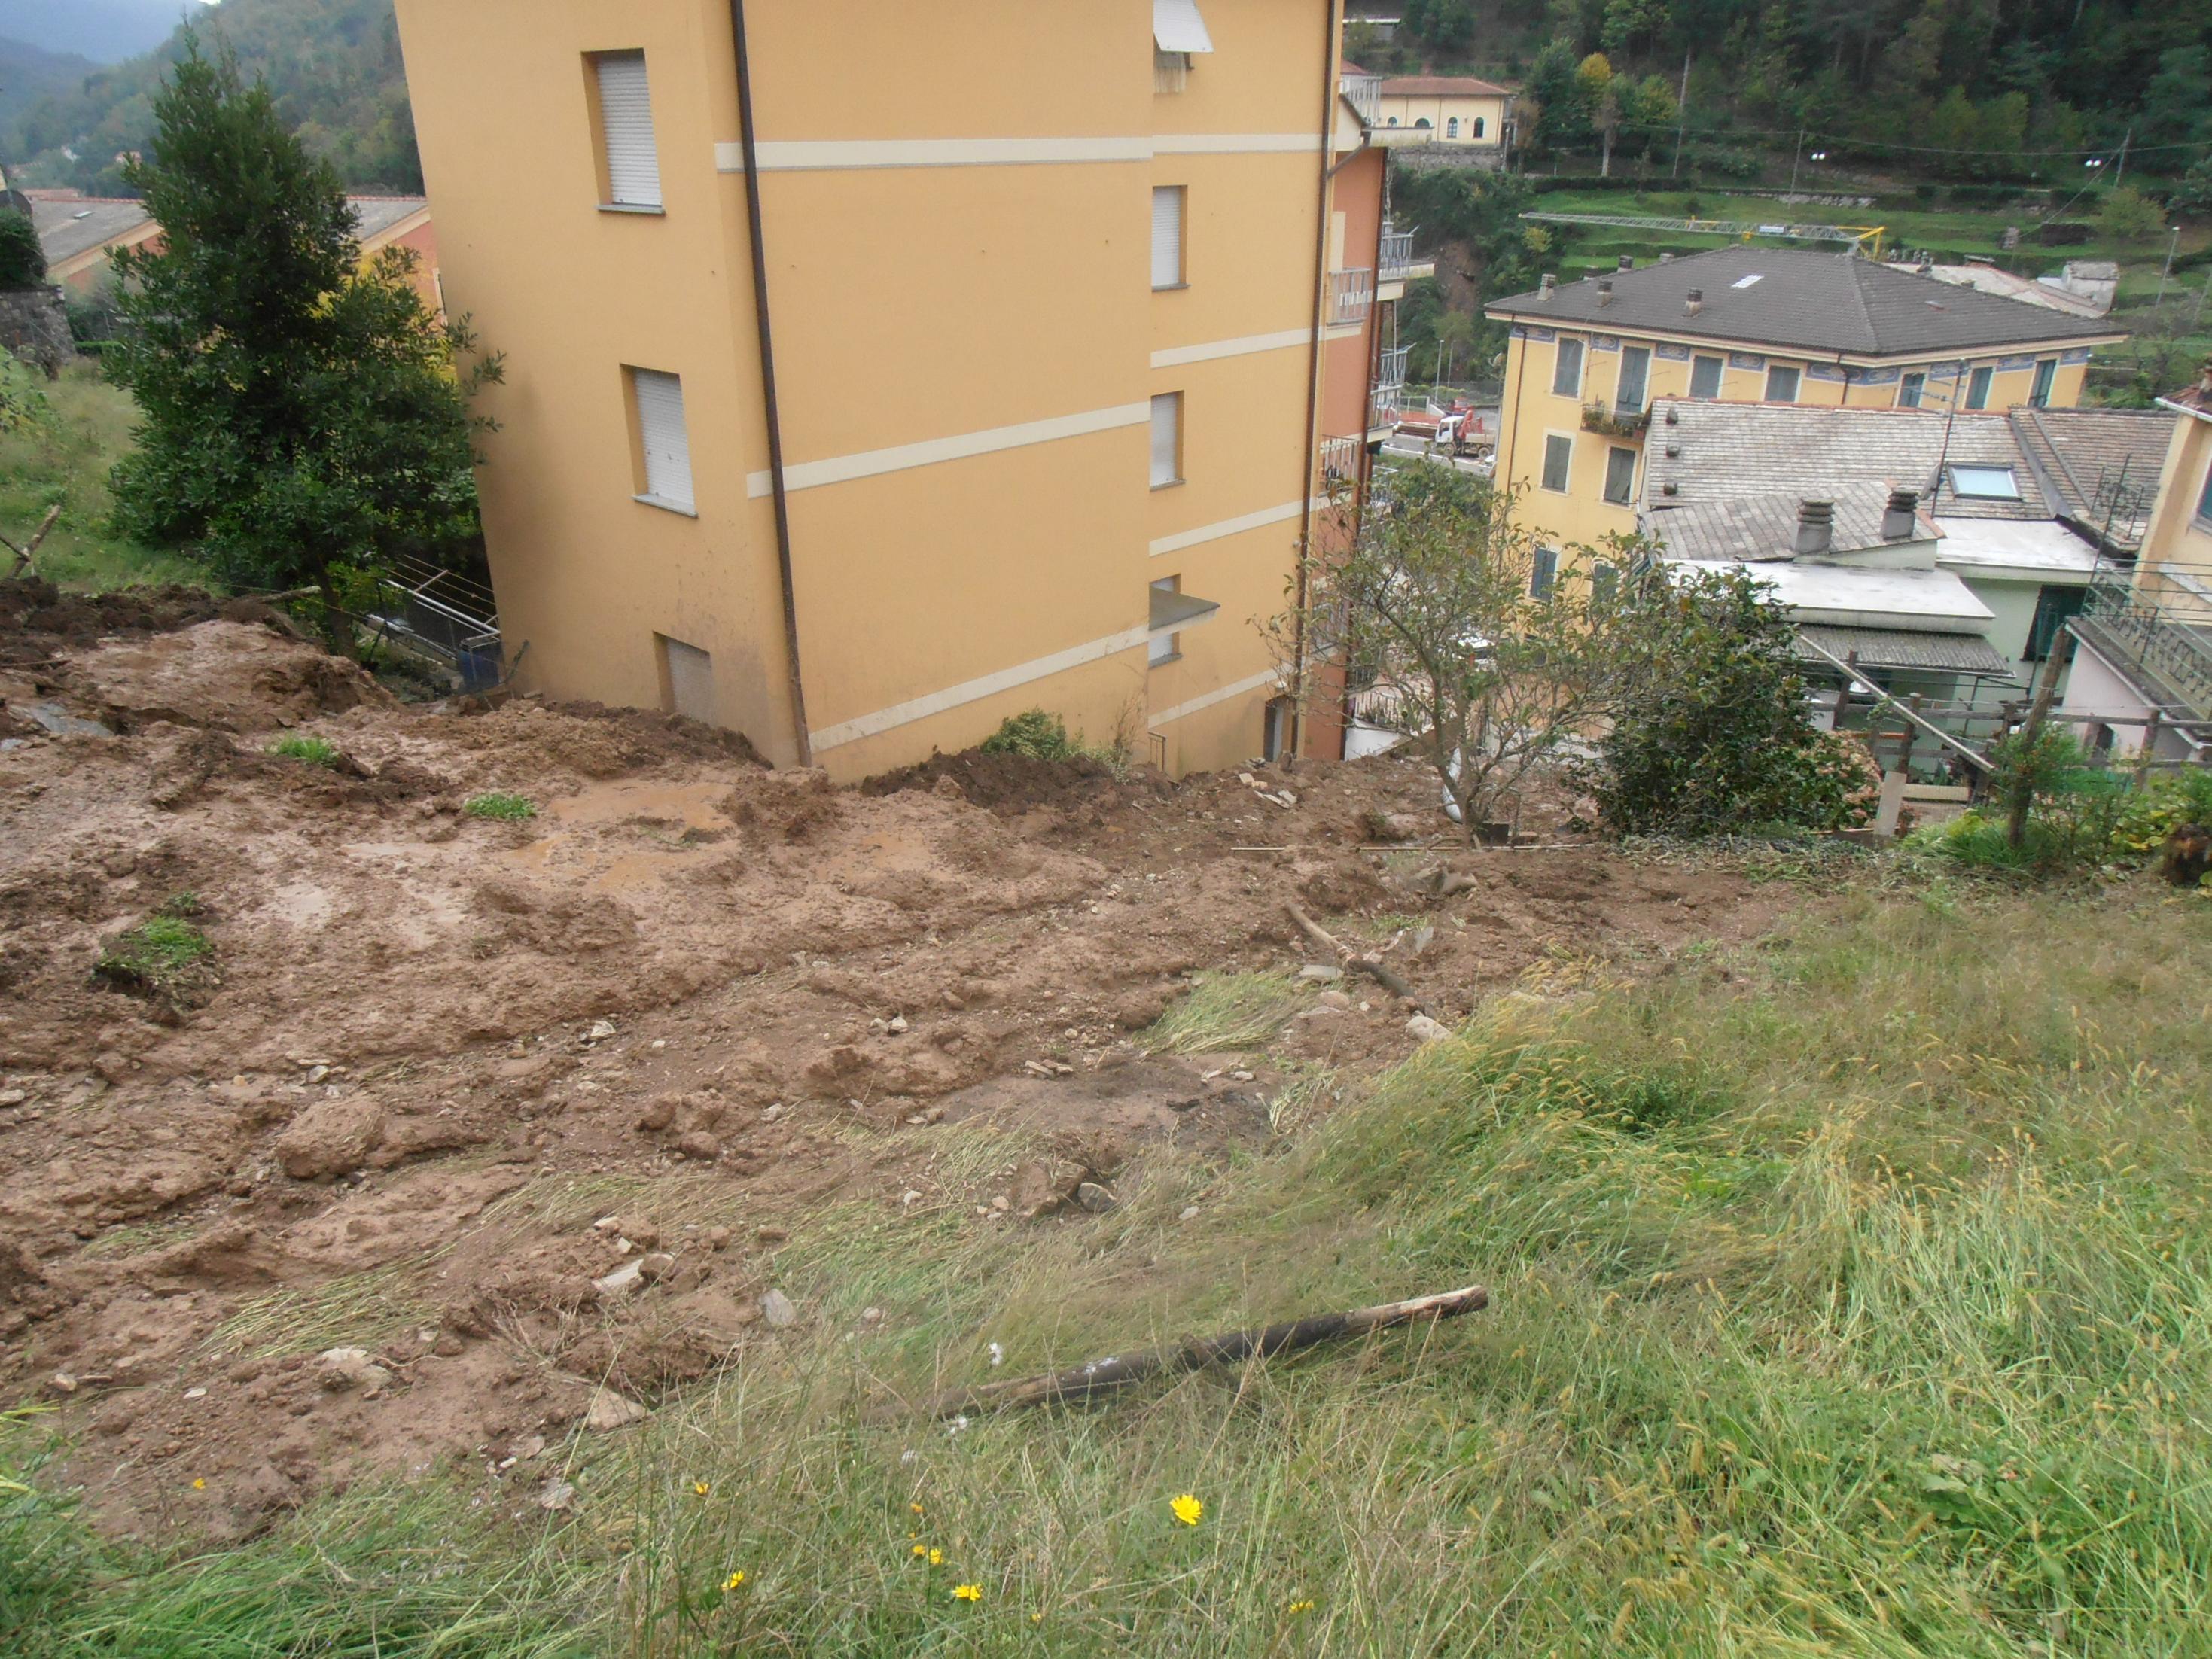 Genova, una frana minaccia tre palazzi: evacuate 200 persone